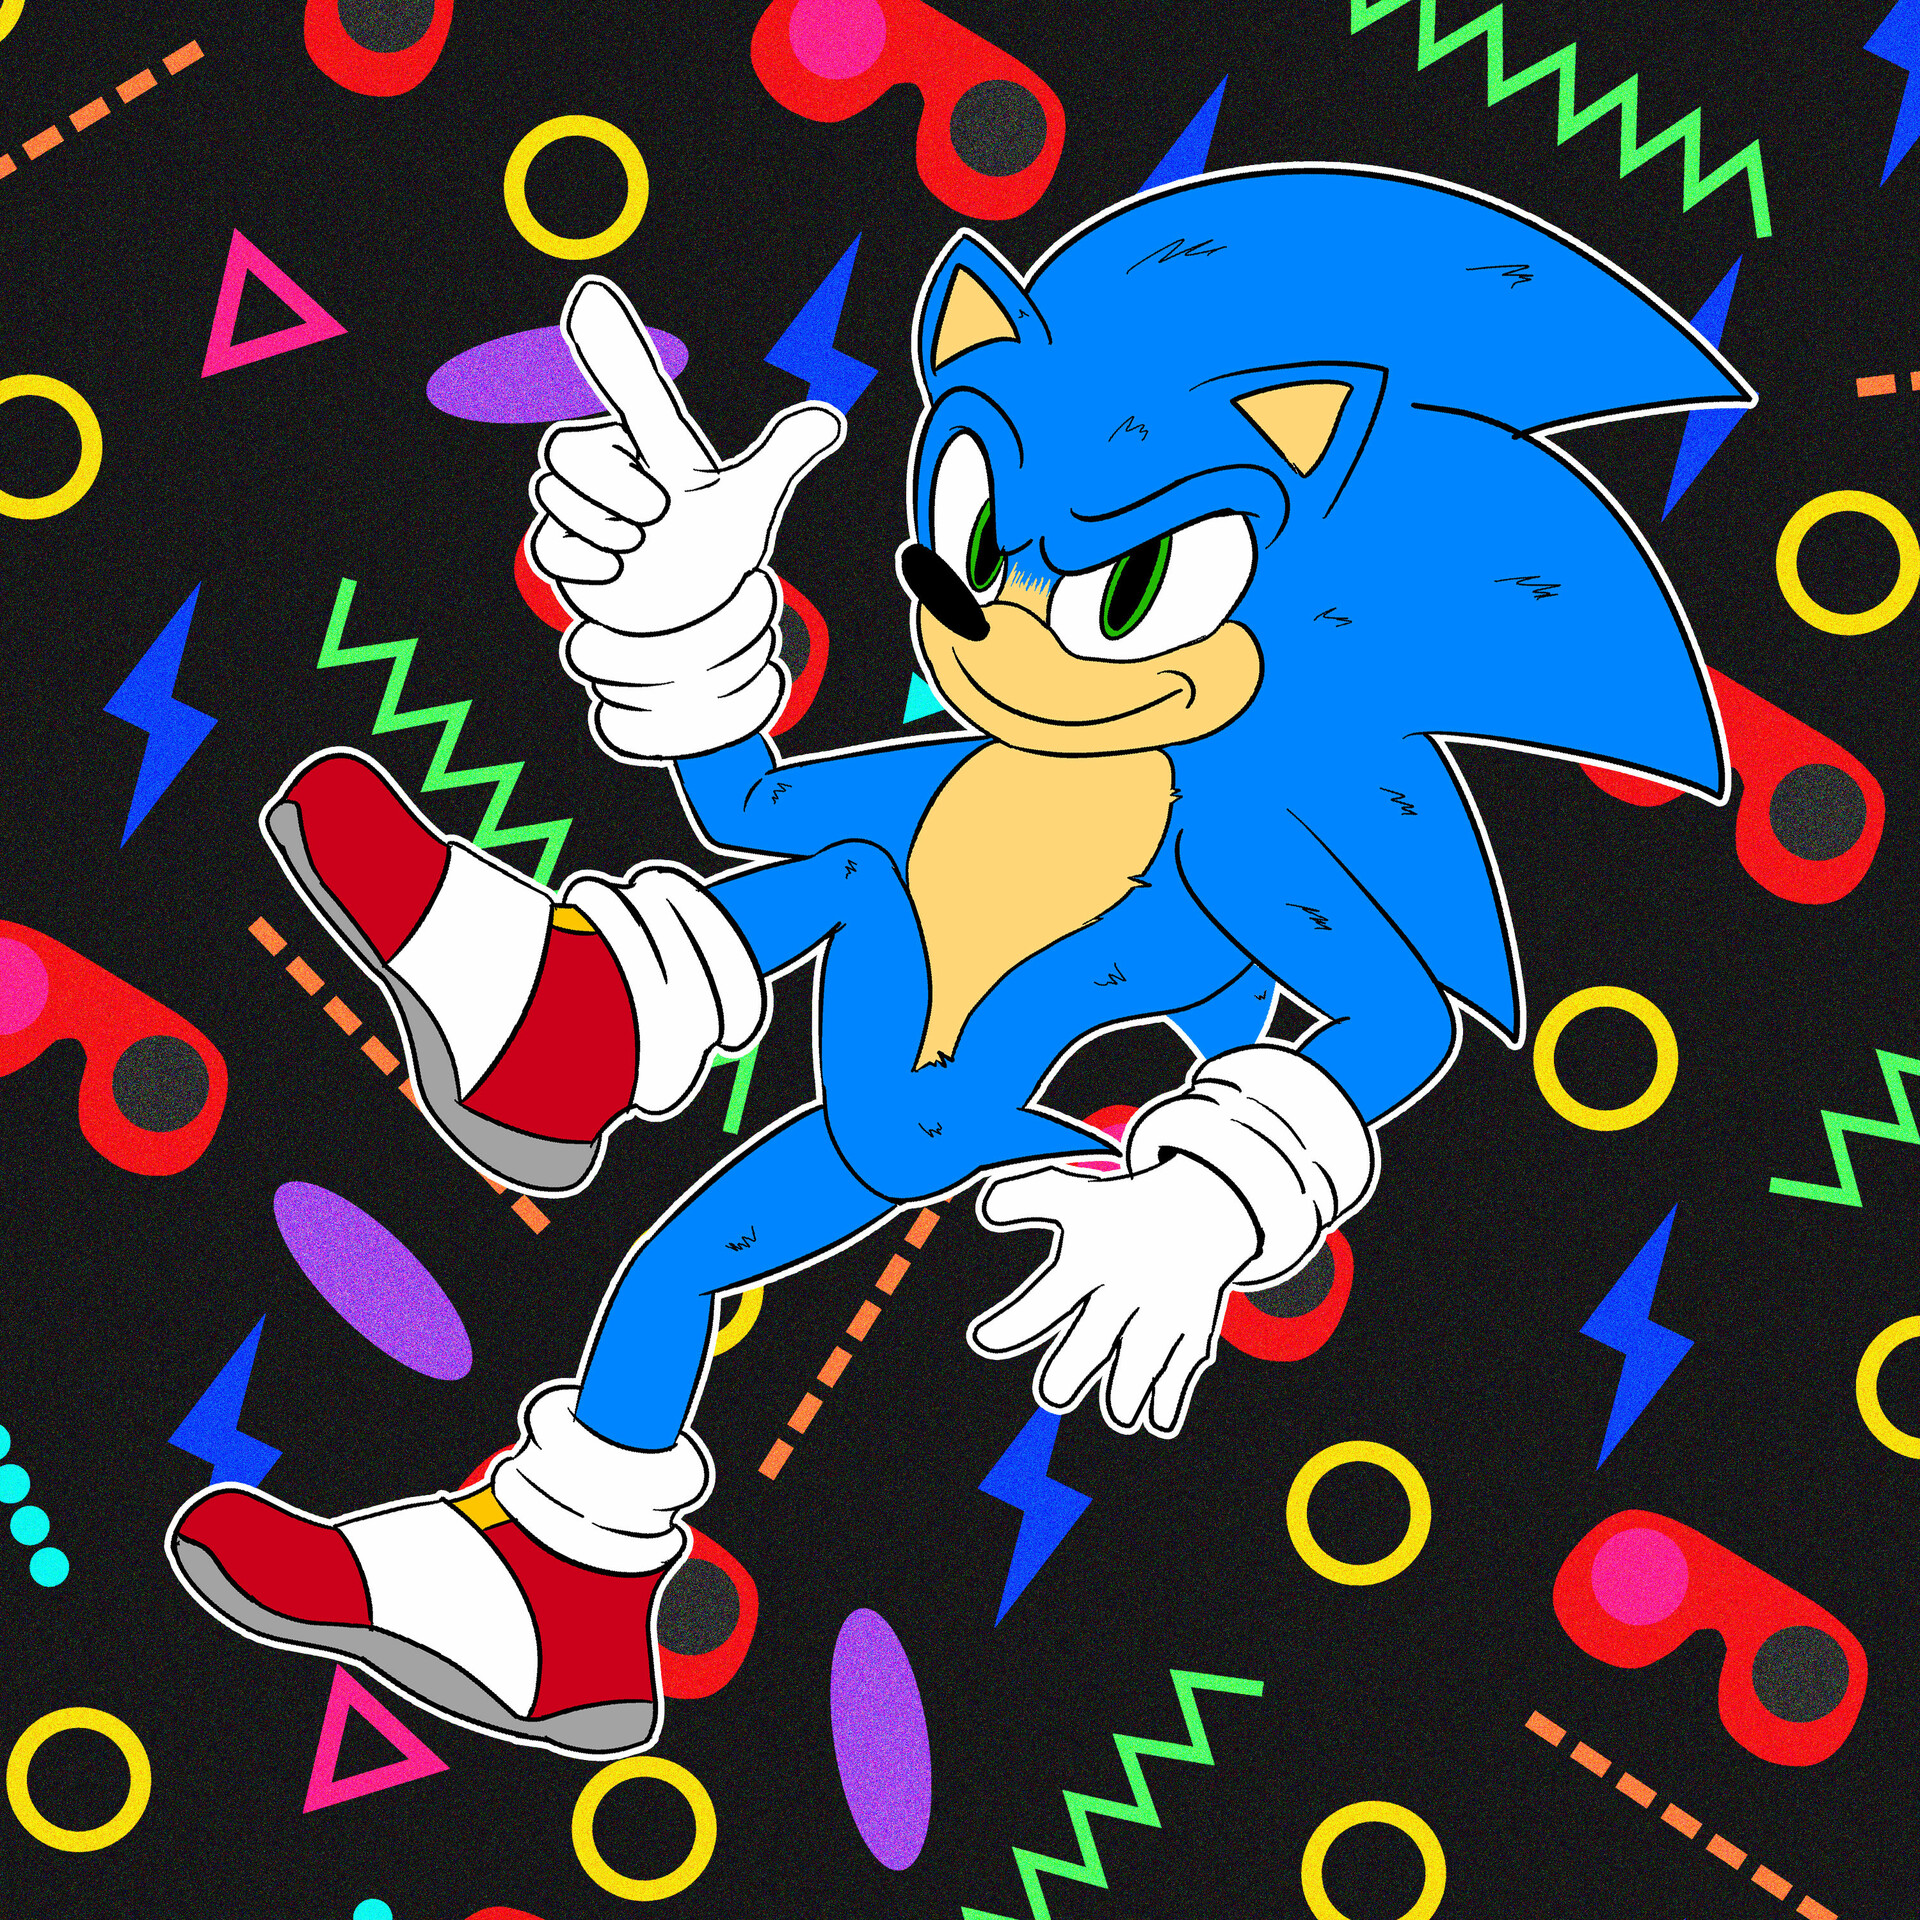 Artstation Sonic The Hedgehog Movie Graphic 2020 Wishyy